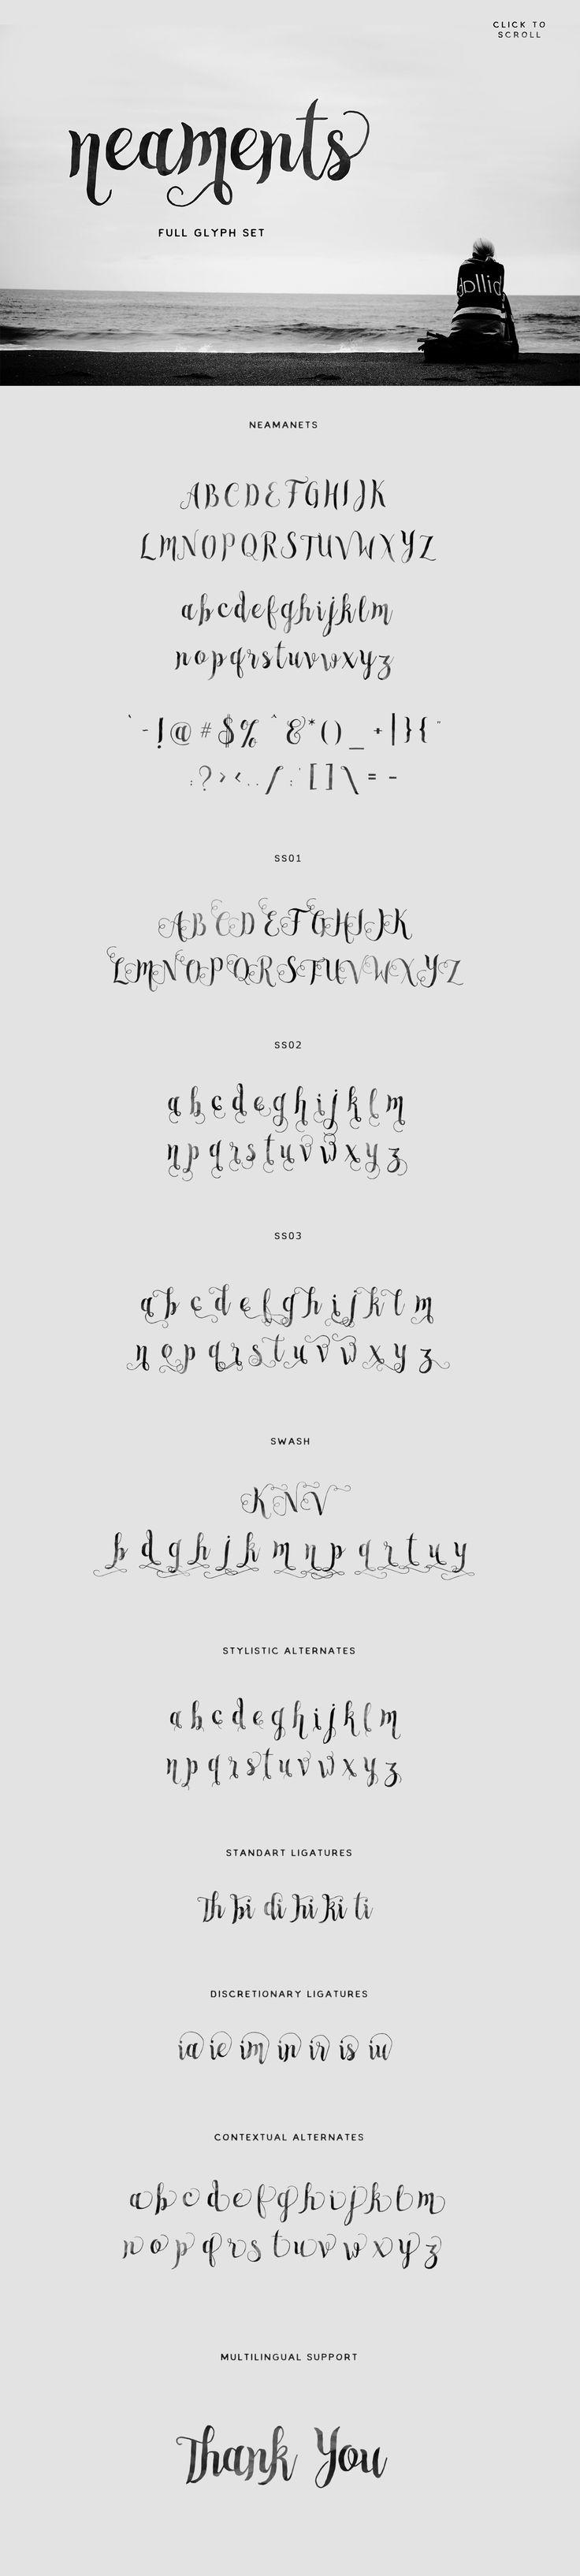 Neaments Typeface by Swistblnk Design Std. on Creative Market